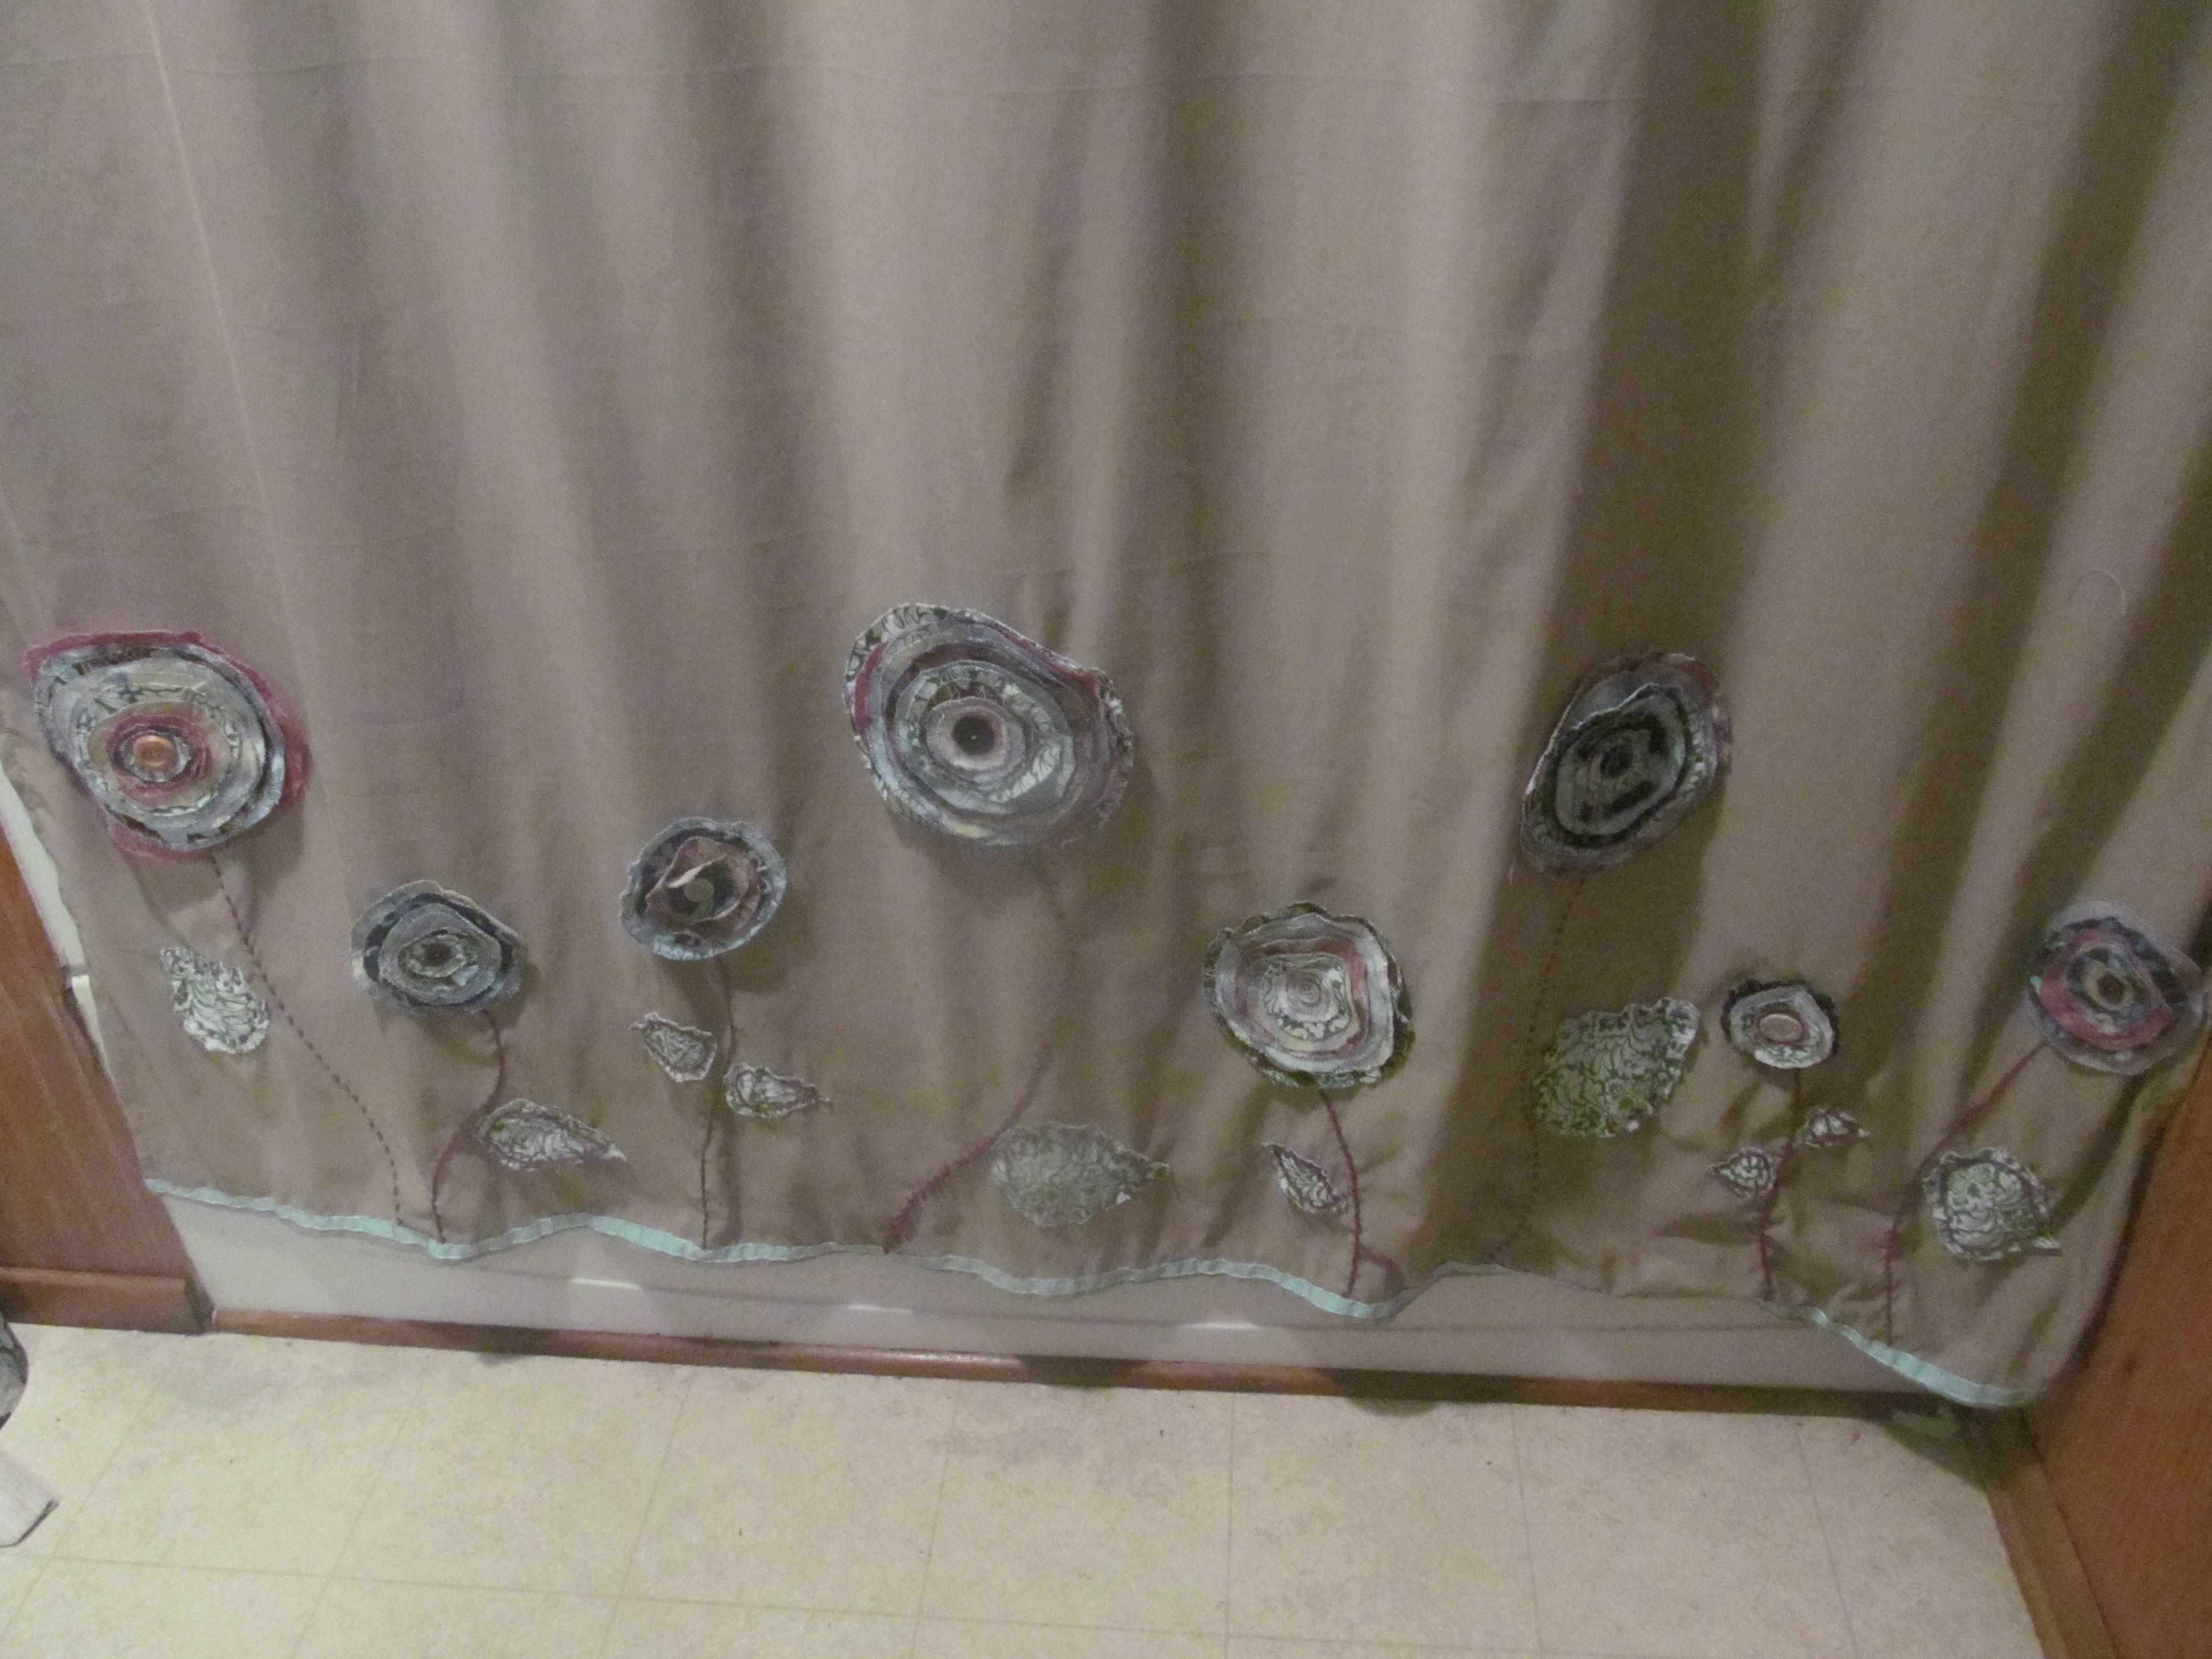 Diy shabby chic fabric flowers - Shabby chic shower curtains ...